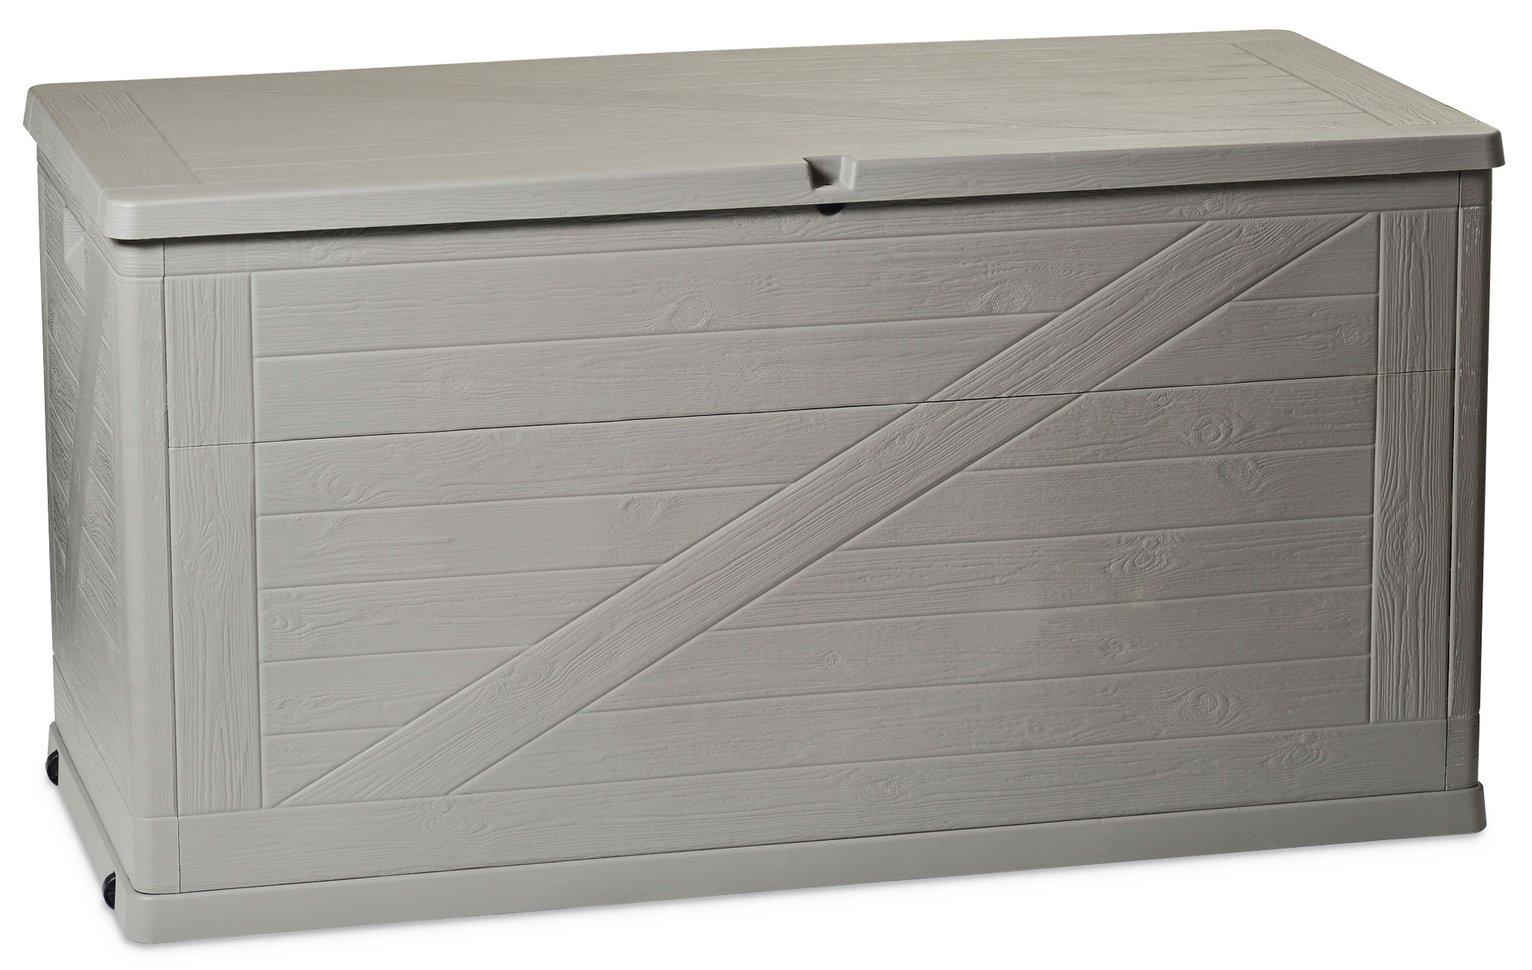 Toomax Santorini 420L Wood Effect Cushion Storage Box - Grey